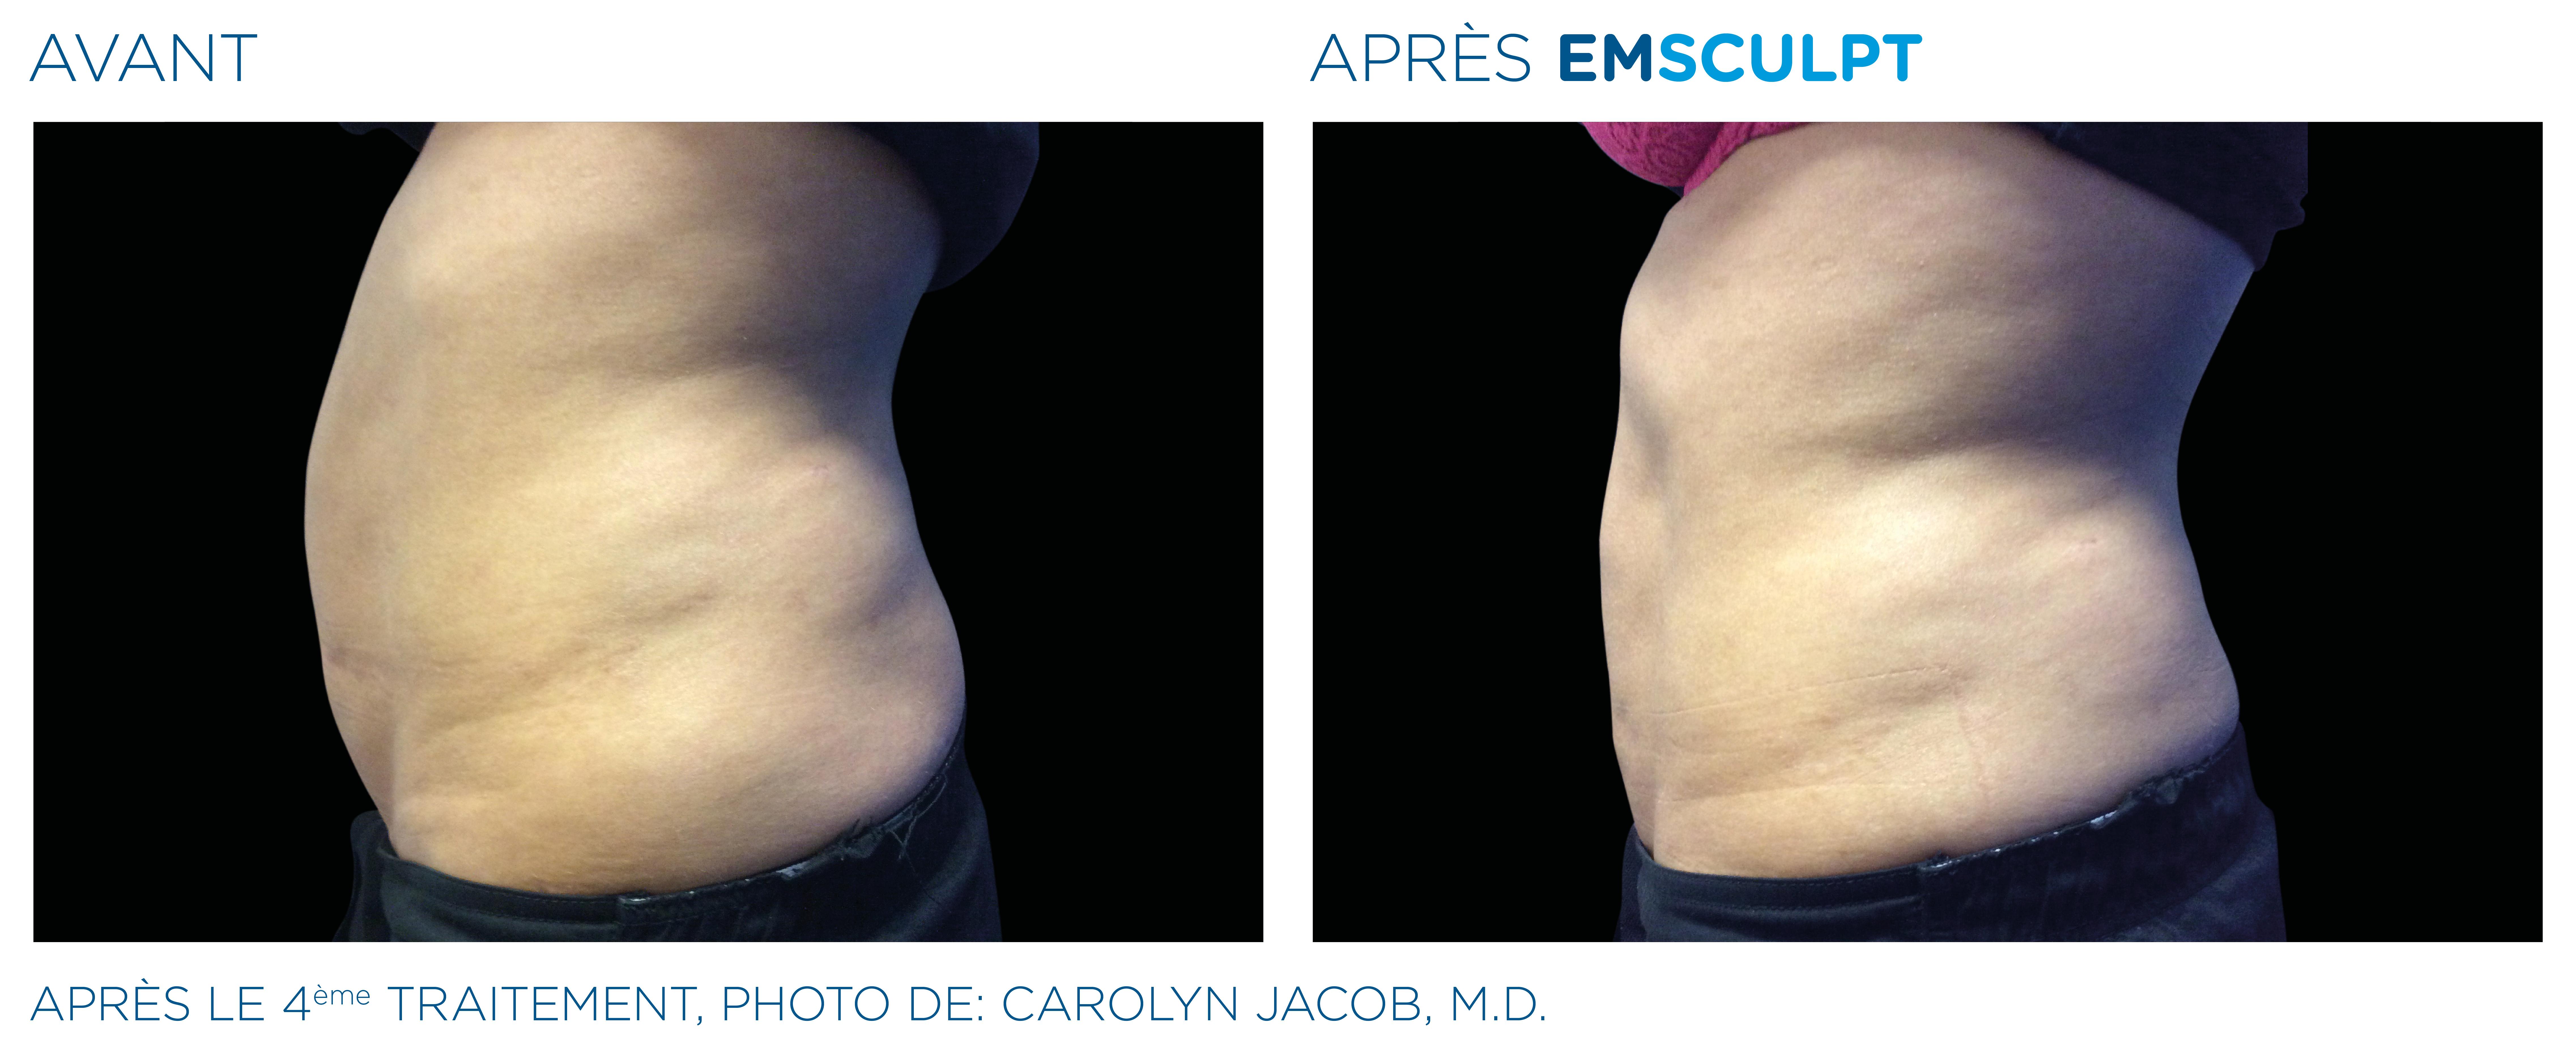 Emsculpt_PIC_Ba-card-female-abdomen-006_FR100